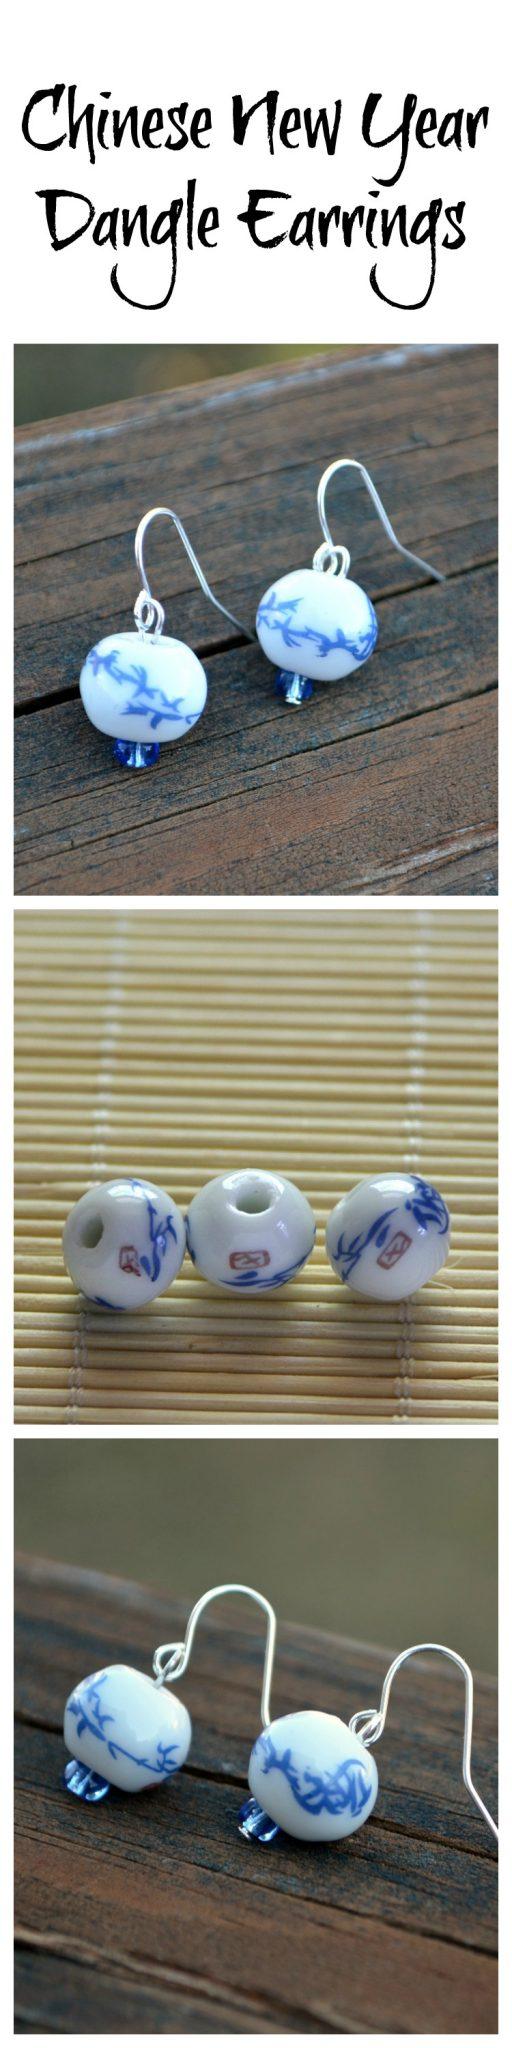 Chinese New Year Dangle Earrings